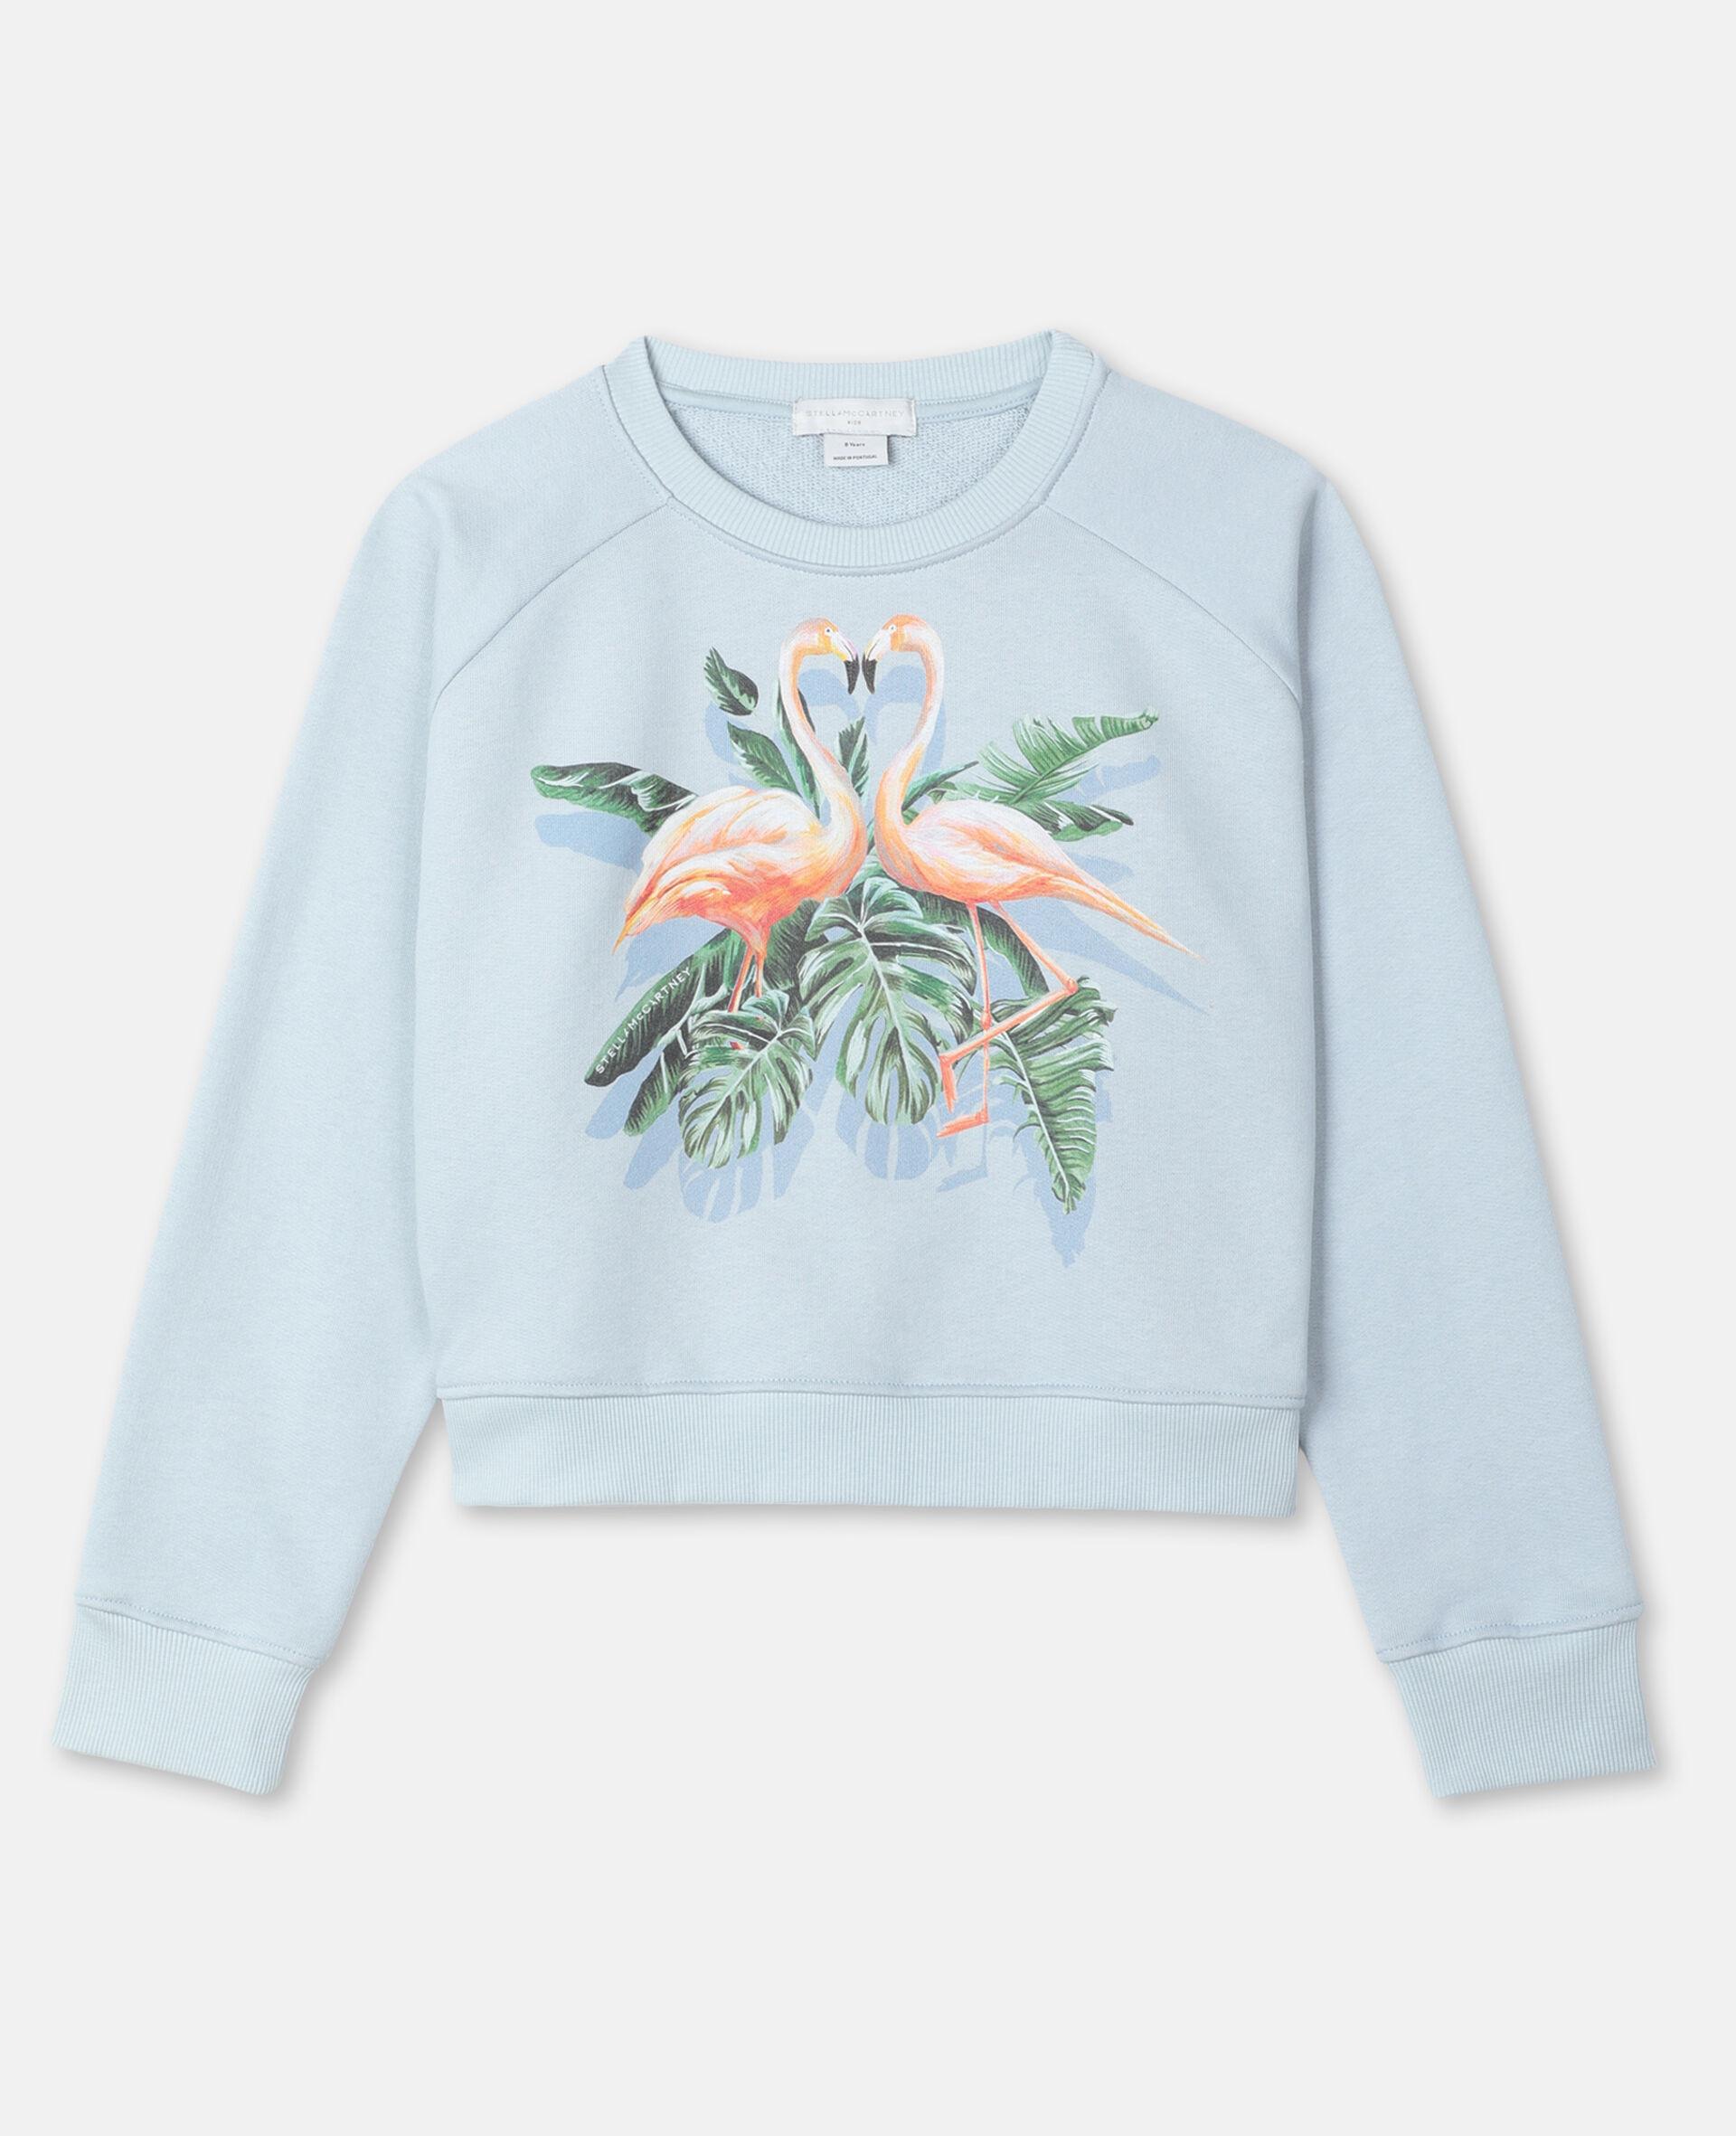 Baumwollfleece-Sweatshirt mit malerischem Flamingo-Print -Blau-large image number 0